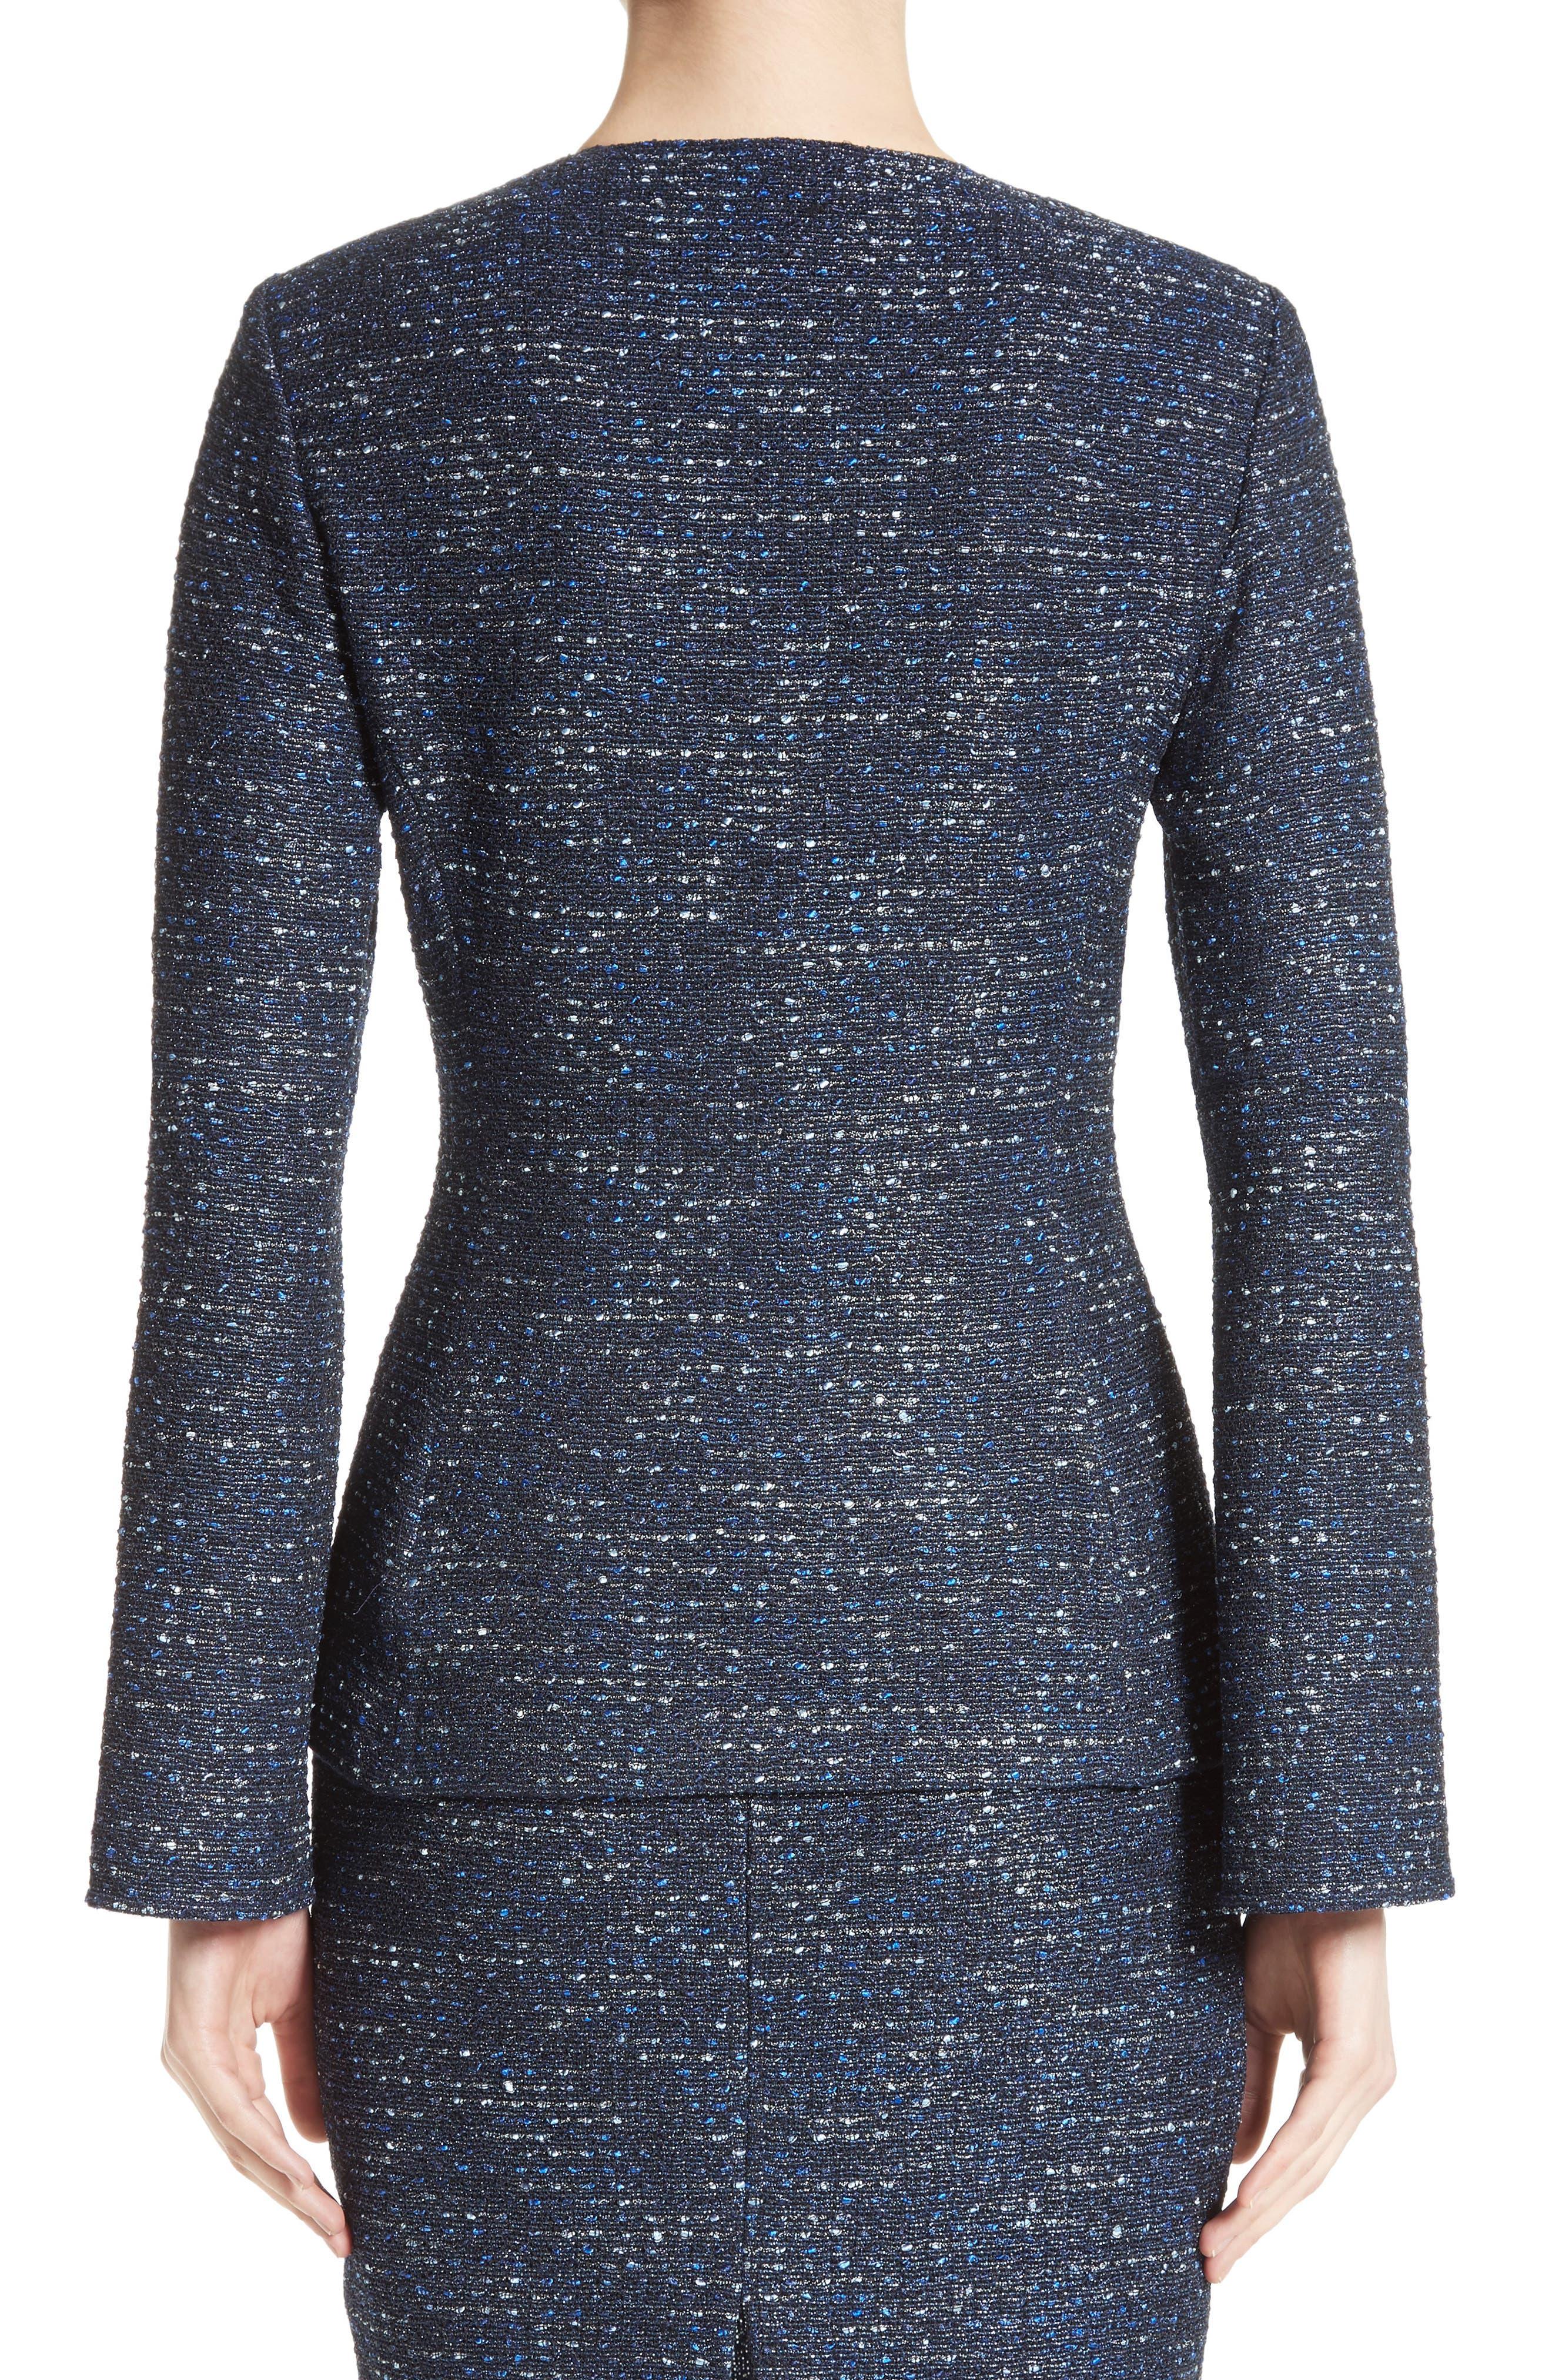 Alternate Image 2  - St. John Collection Alisha Sparkle Tweed Jacket